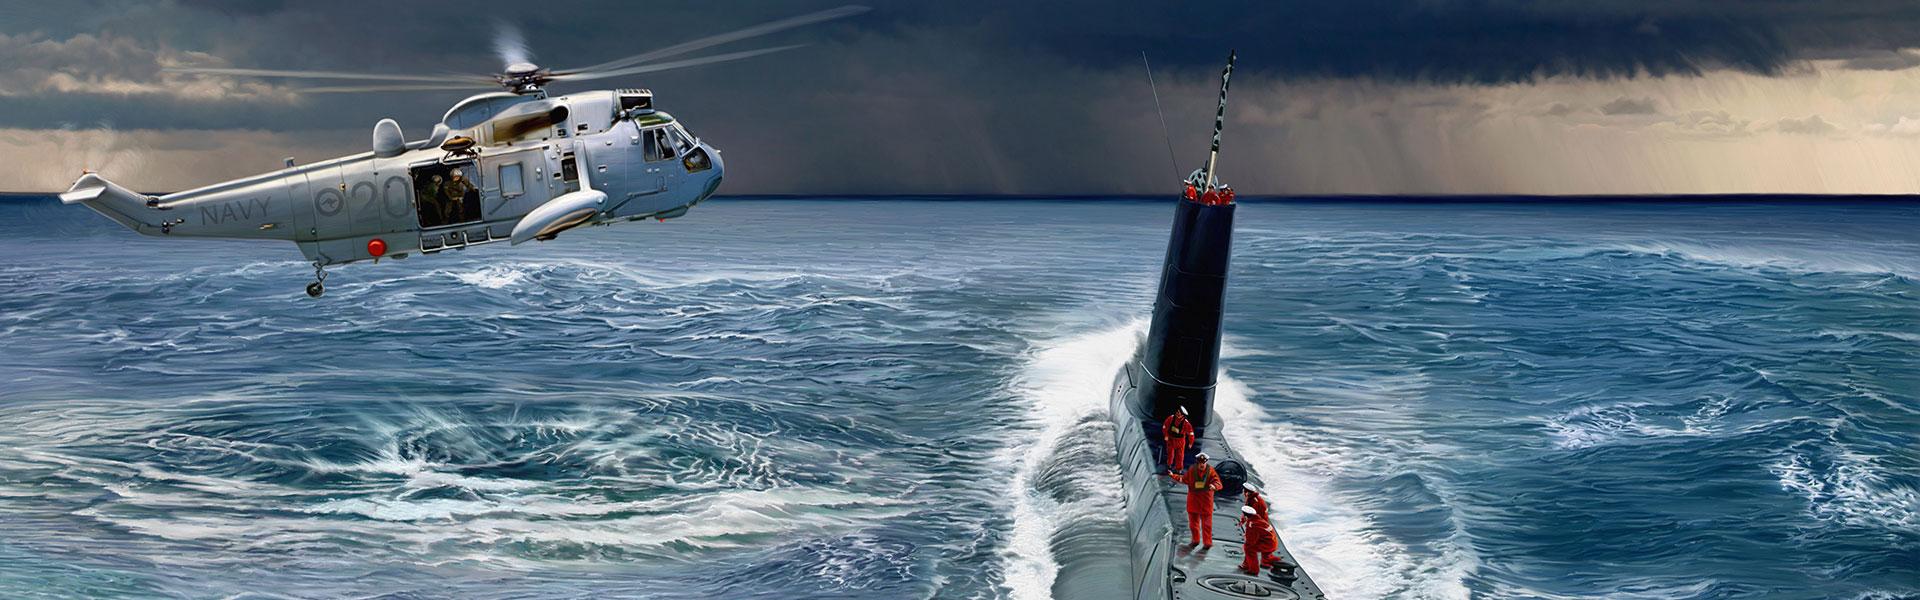 HMAS-Orion-Oberon-Class-slider